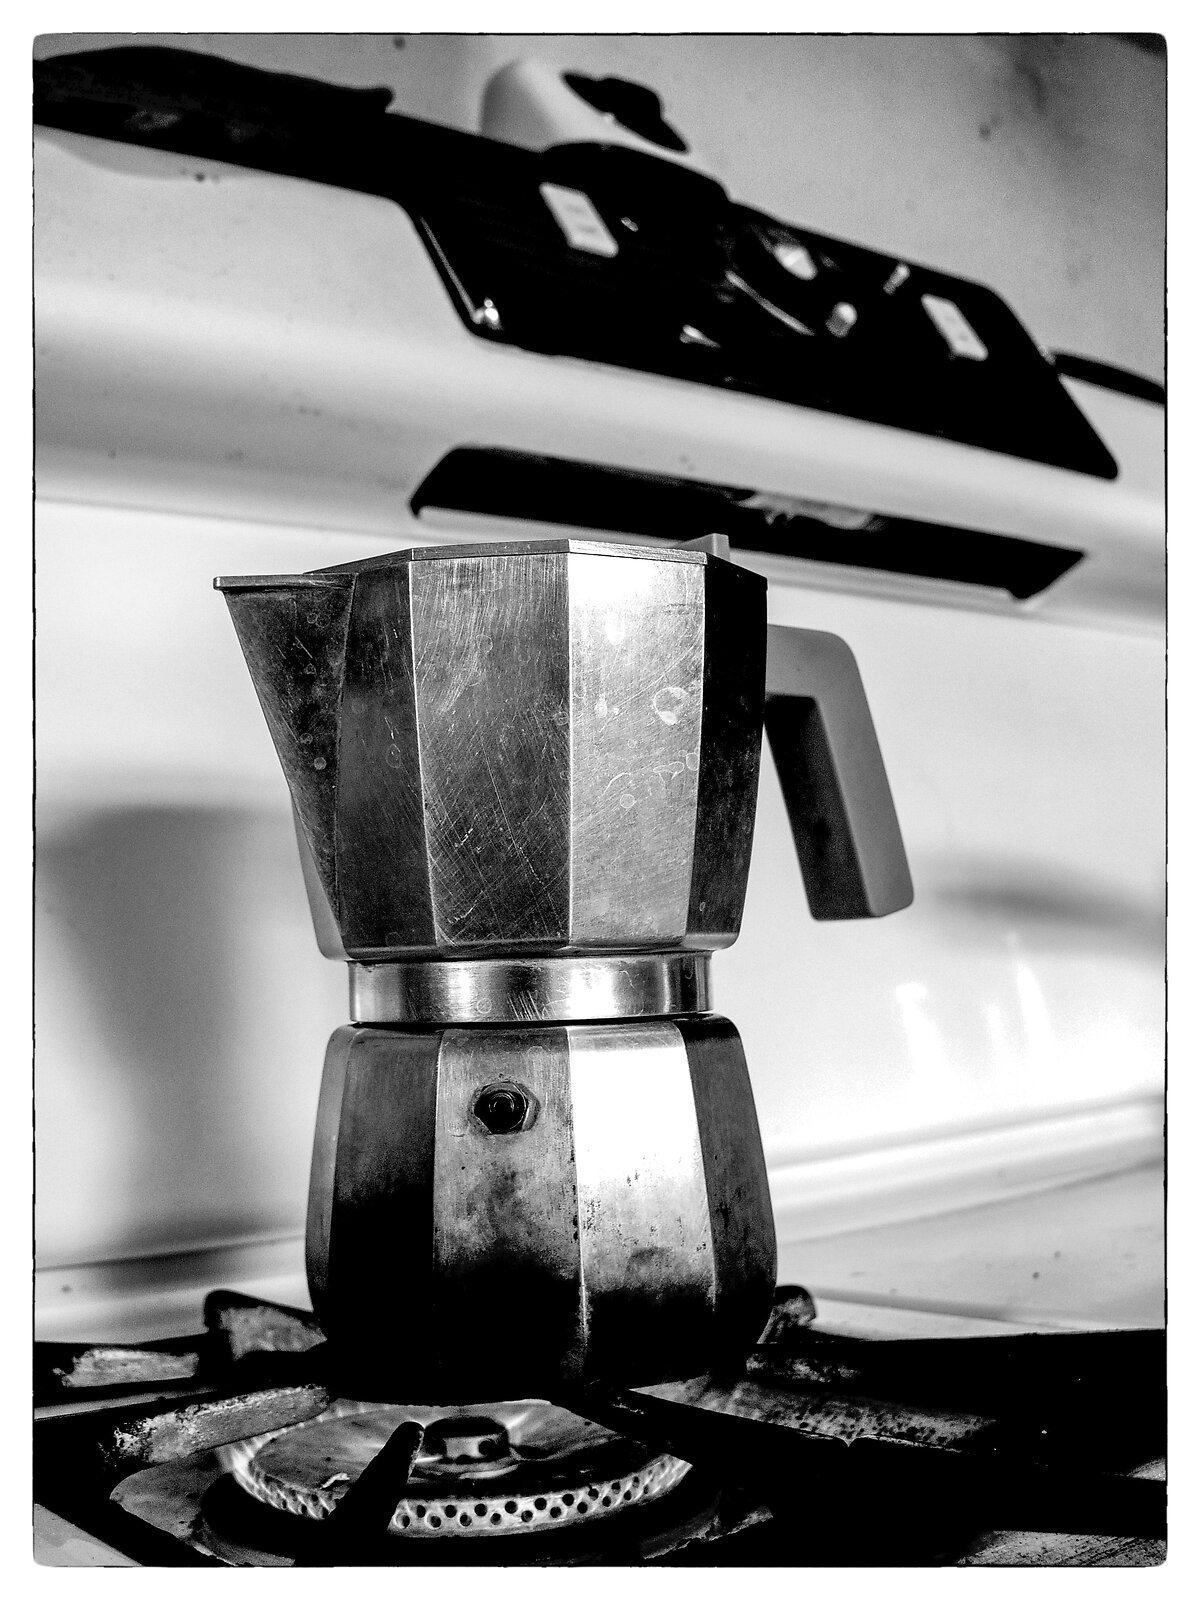 Q7_Mar5_21_Café#3.jpg